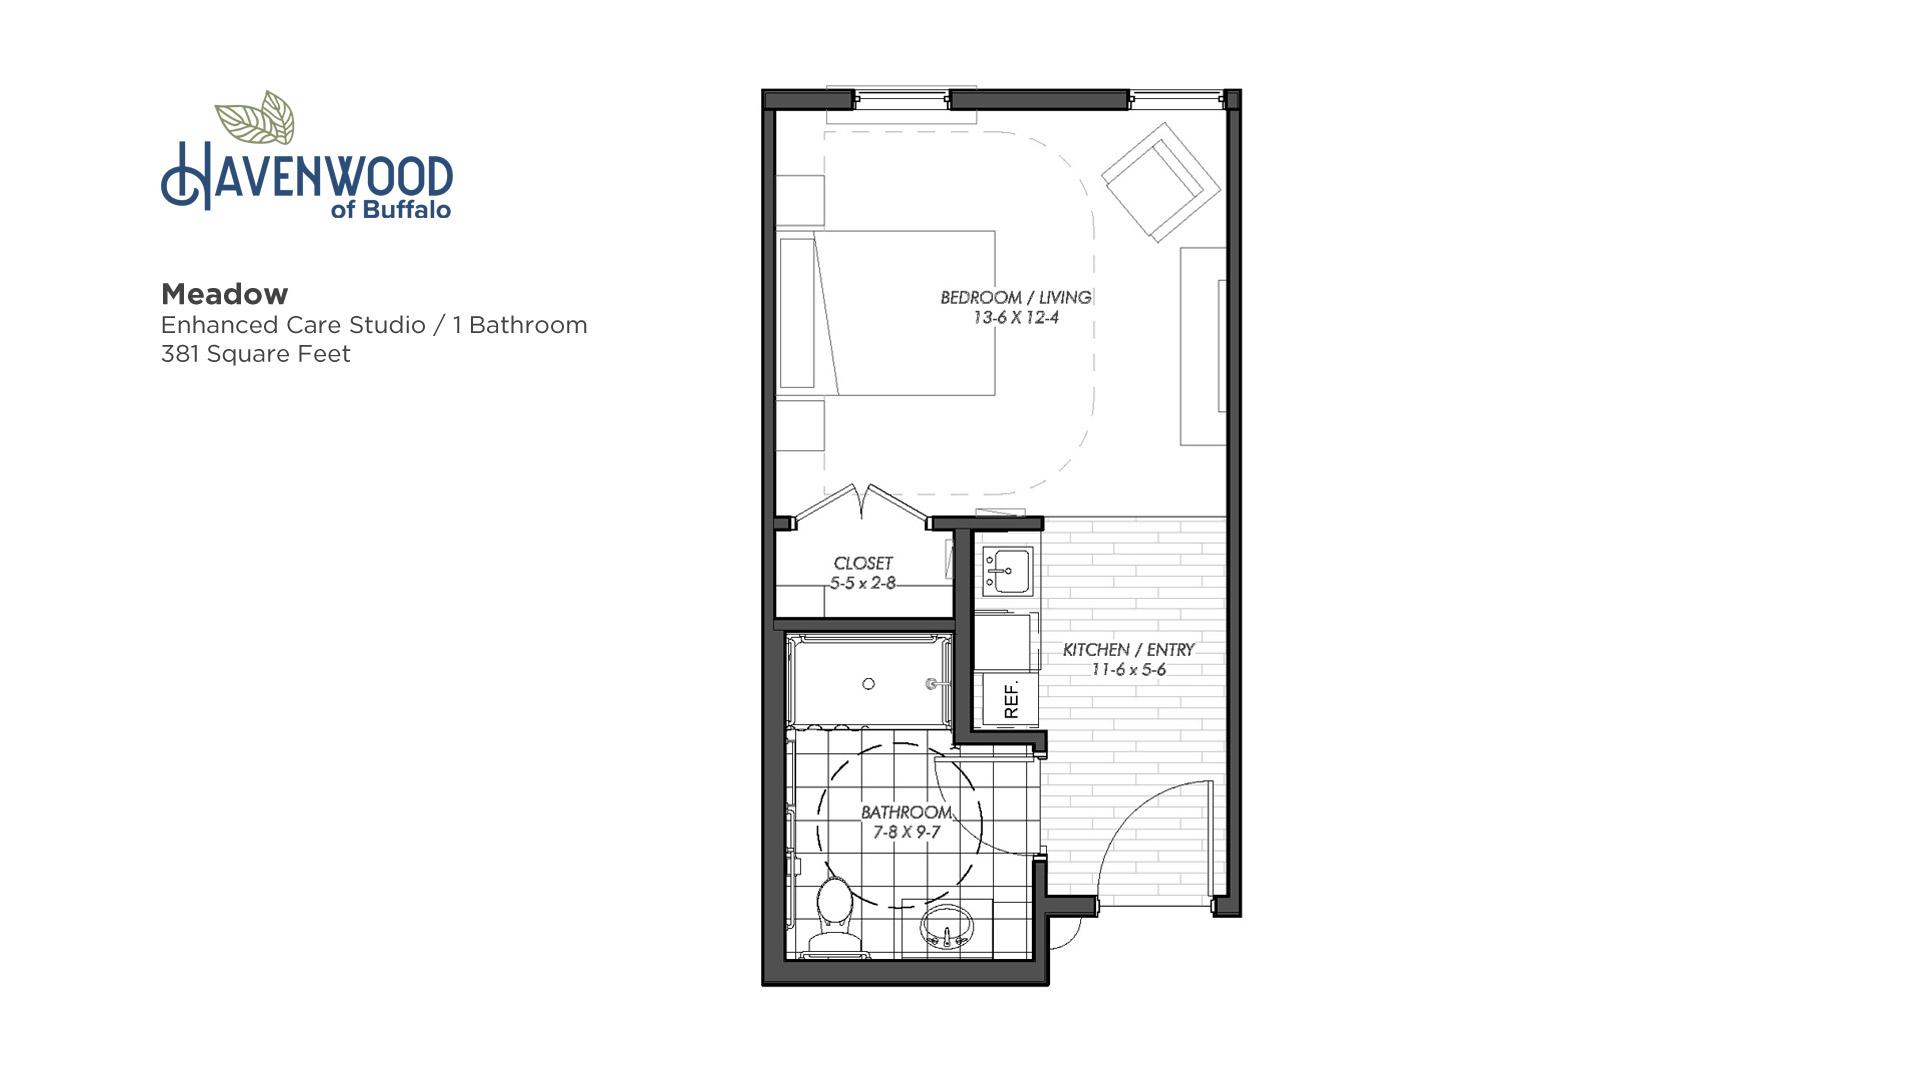 Havenwood of Buffalo Meadow Floor Plan